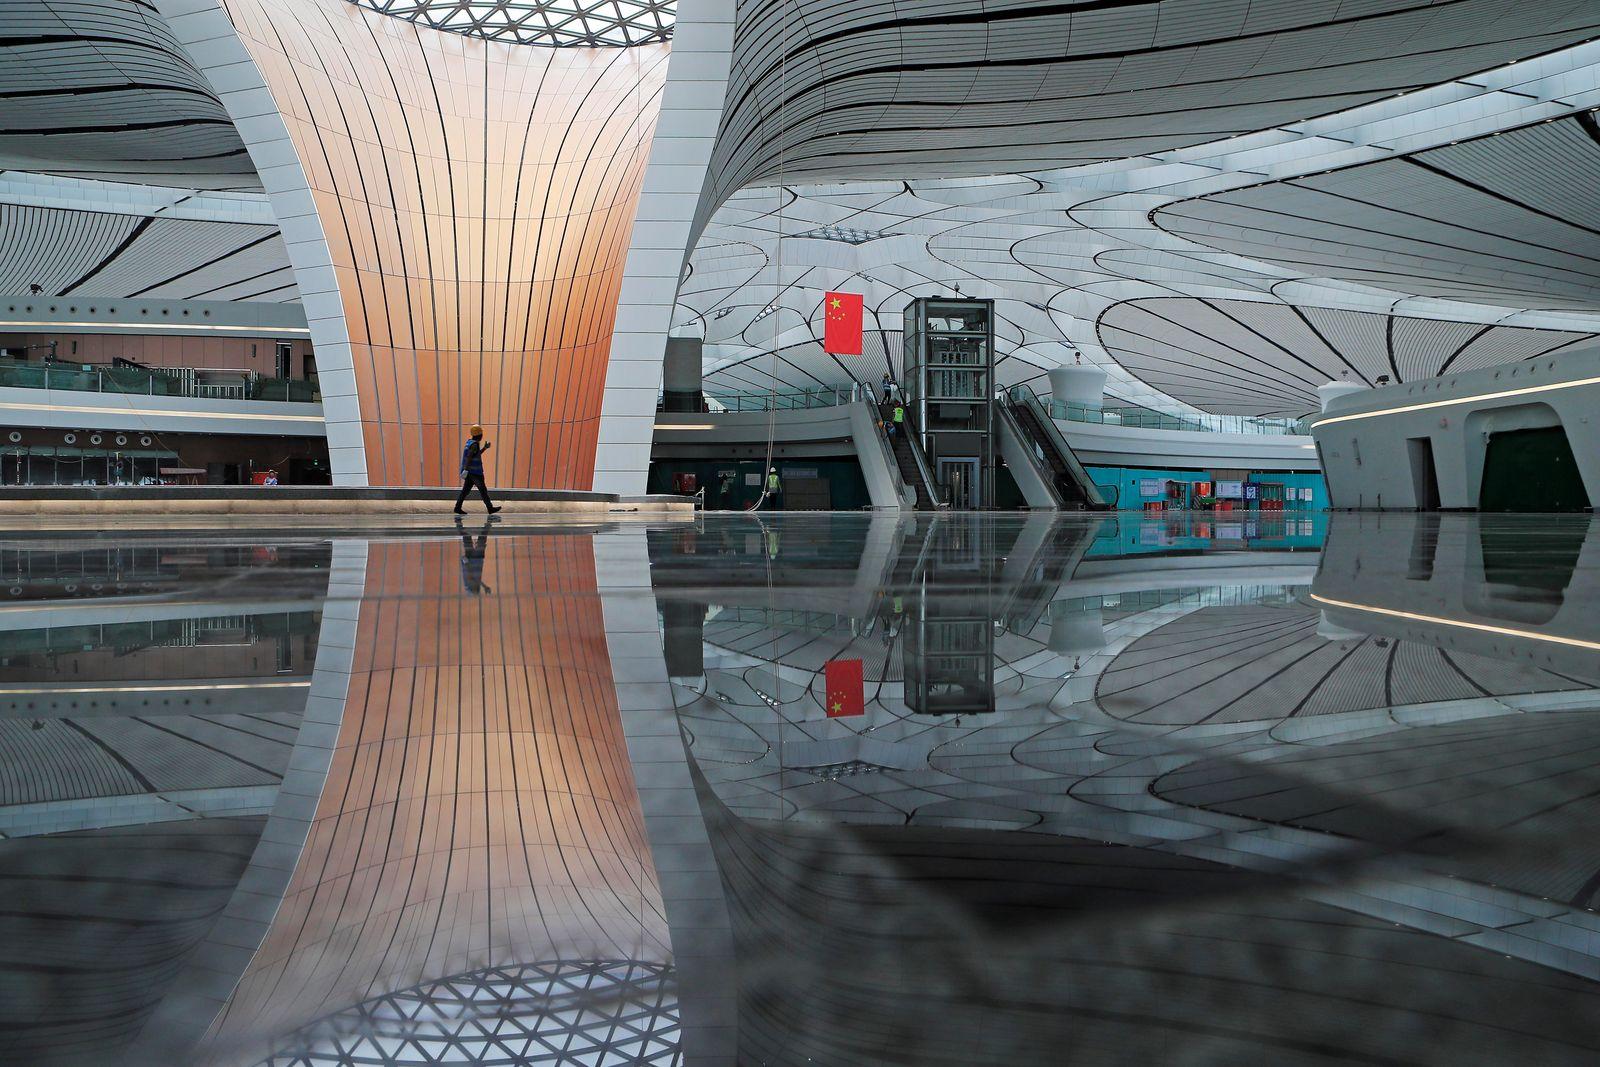 Worker walks inside the terminal hall of the Beijing Daxing International Airport under construction in Daxing district, Beijing